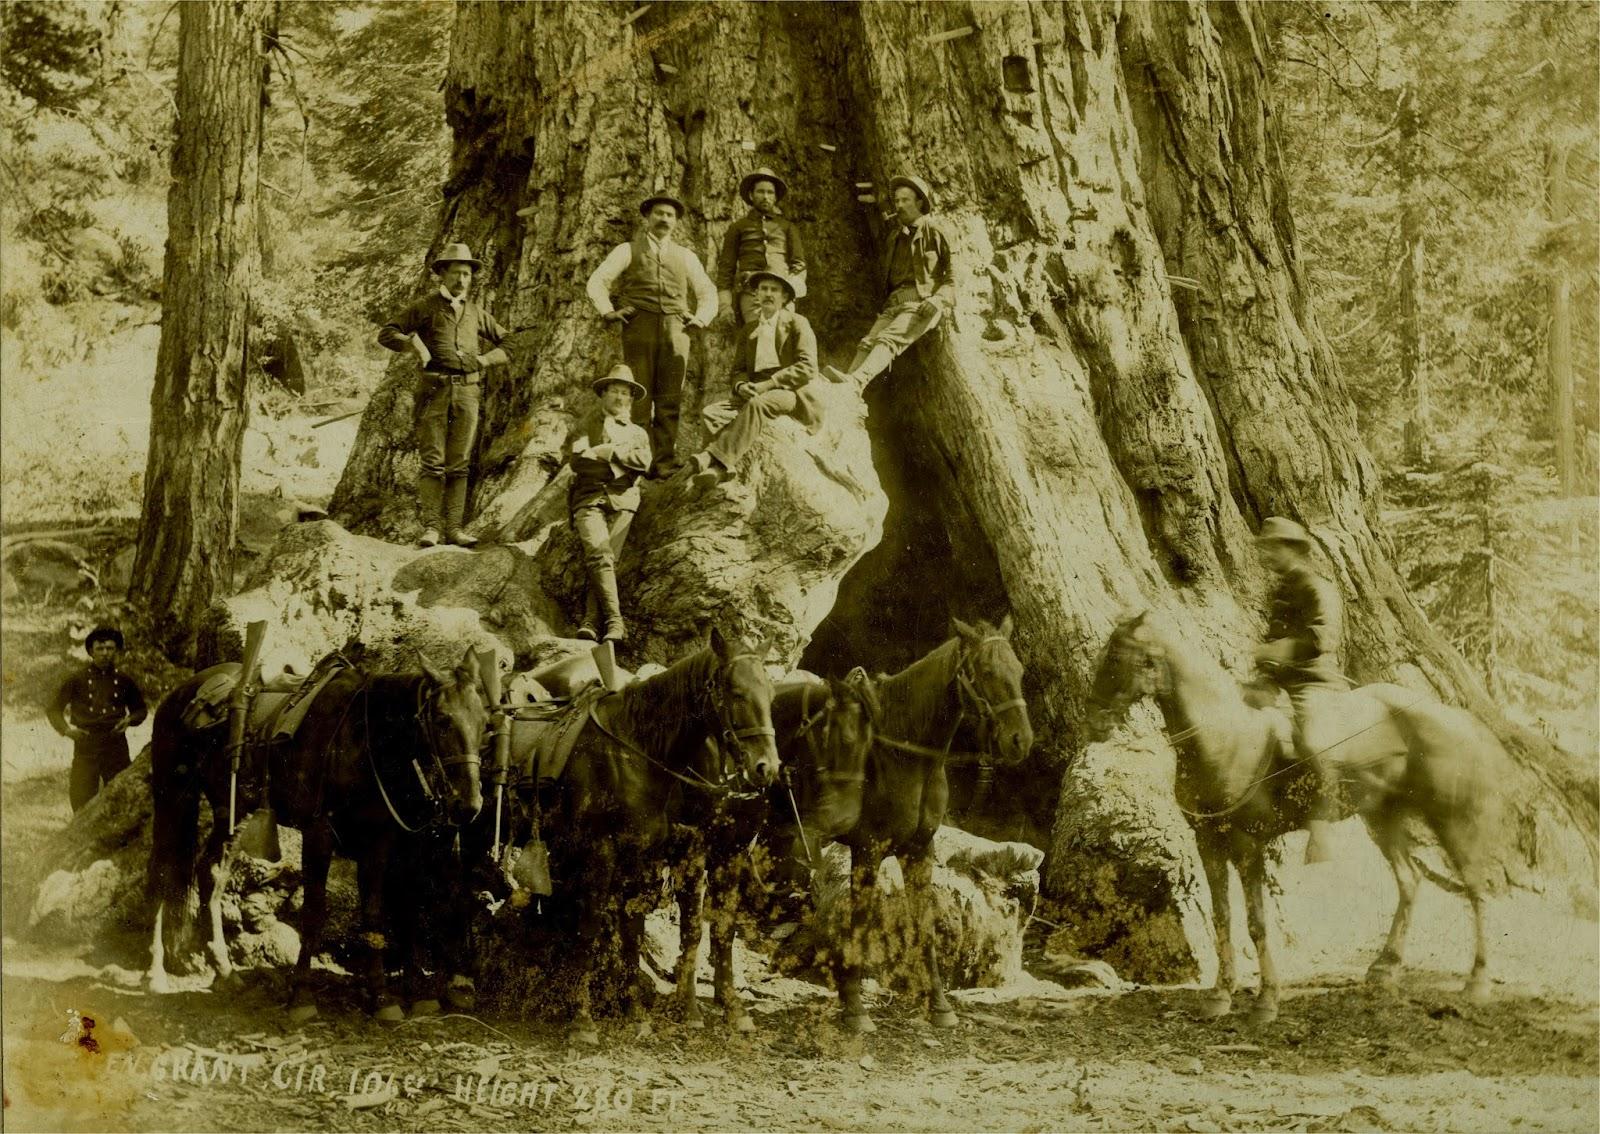 ... cavalrymen.... R C Moore Lumber Company